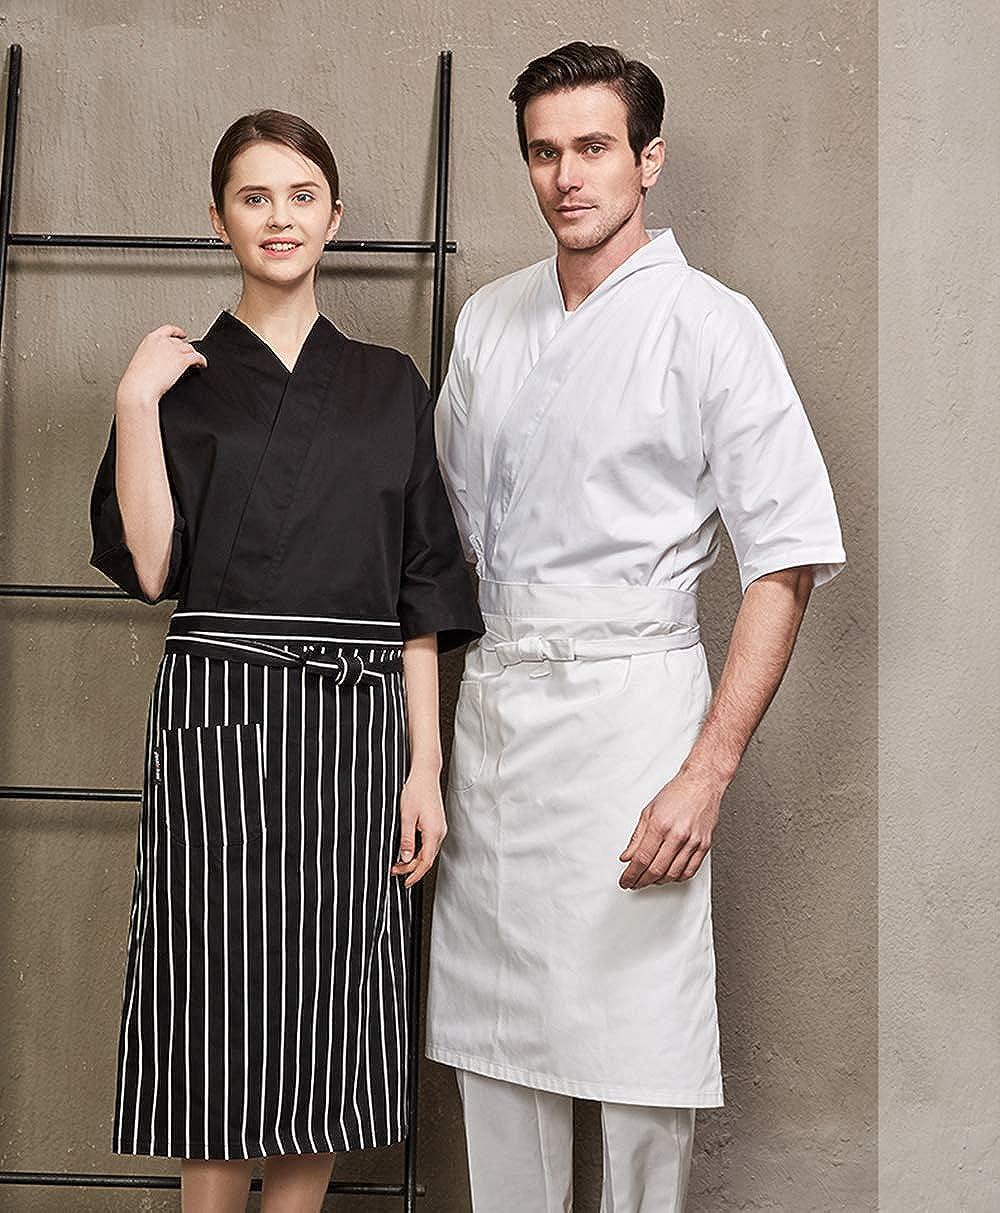 XINFU Chefs Japanese Kimono Unisex Uniform Short Sleeved Working Clothes Kitchen Restaurant Chef Jacket